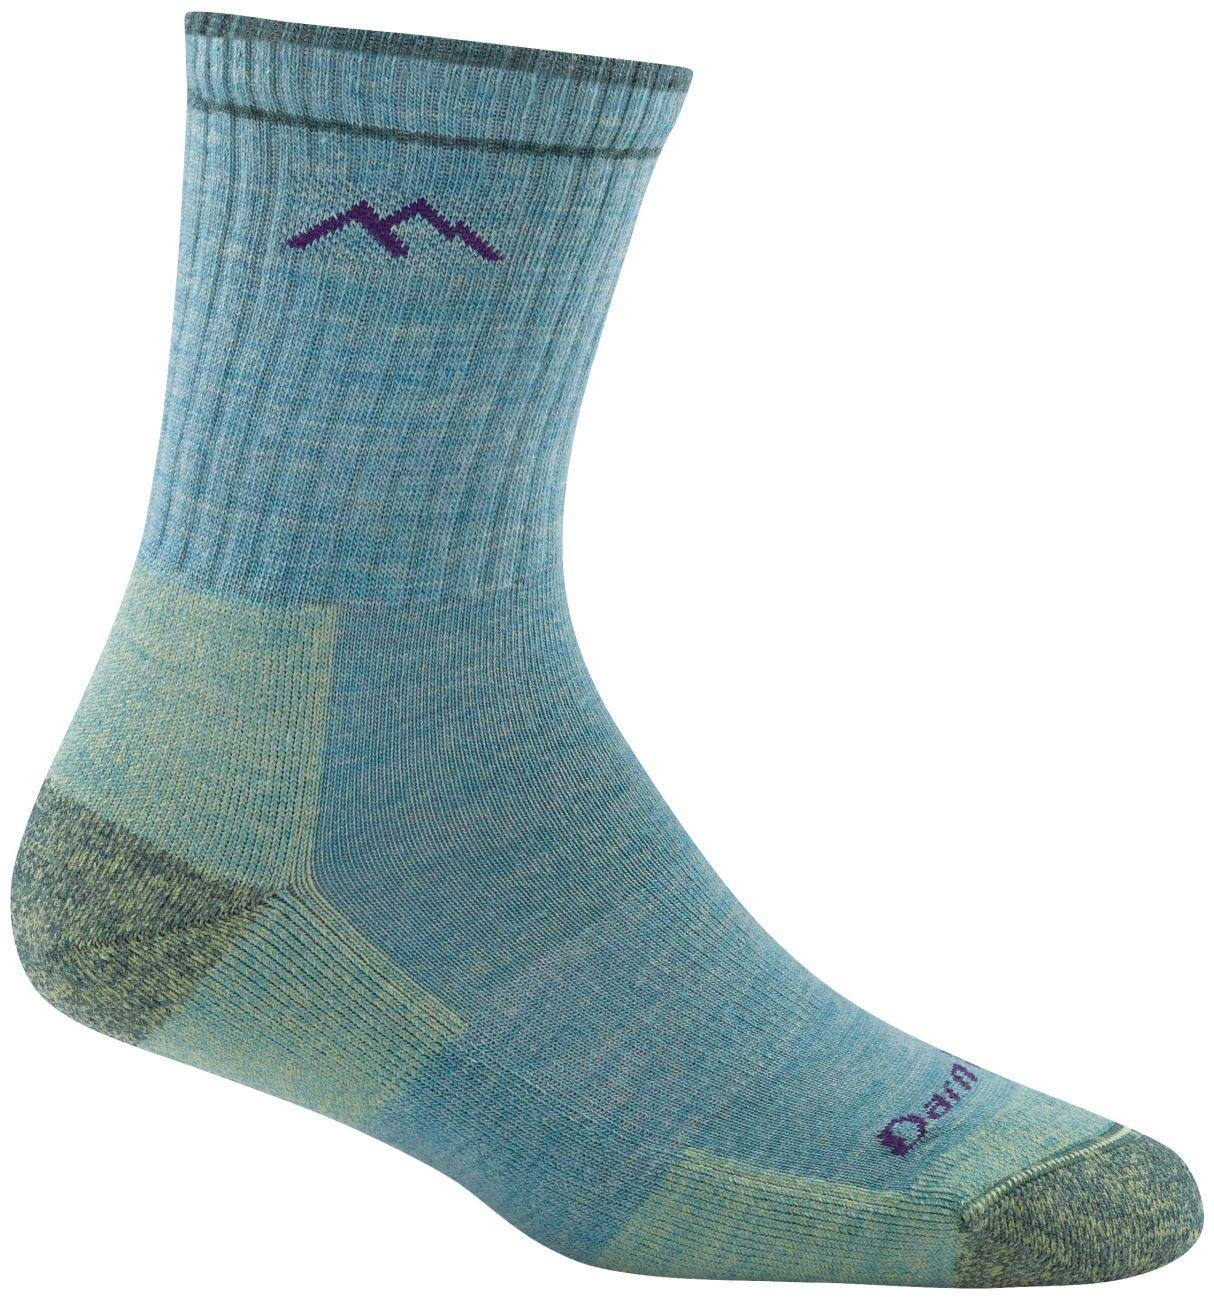 Darn Tough Hiker Micro Crew Cushion Socks - Women's Aqua Heather Medium by Darn Tough